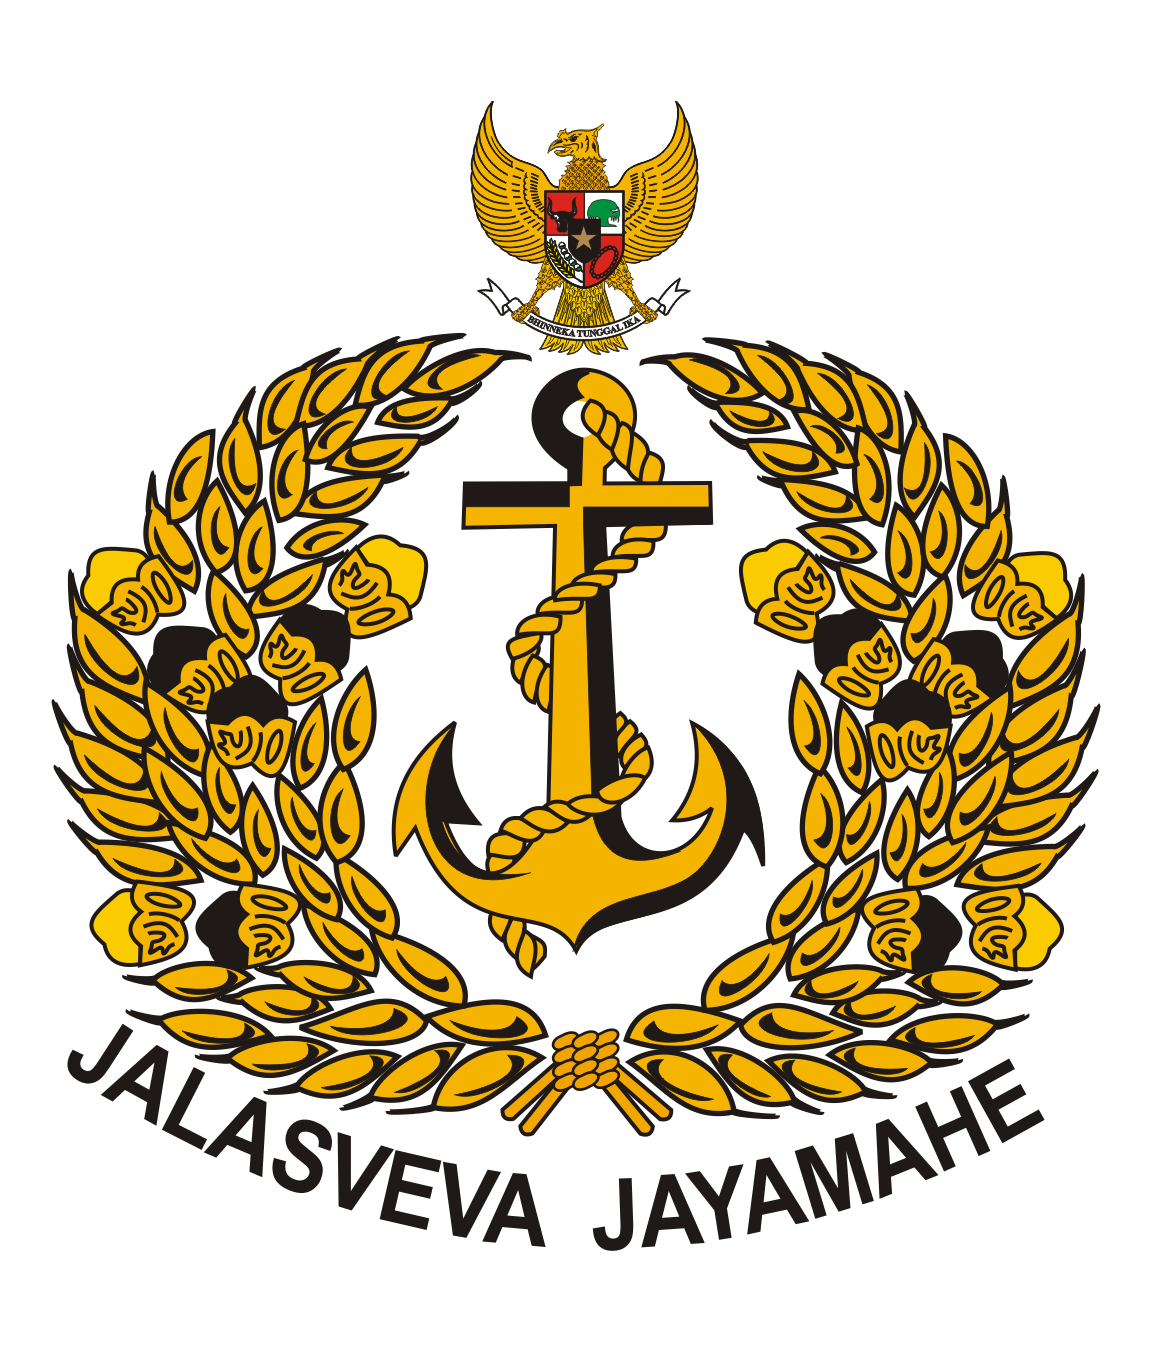 Logo TNI AL (Tentara Negara Indonesia Angkatan Laut)